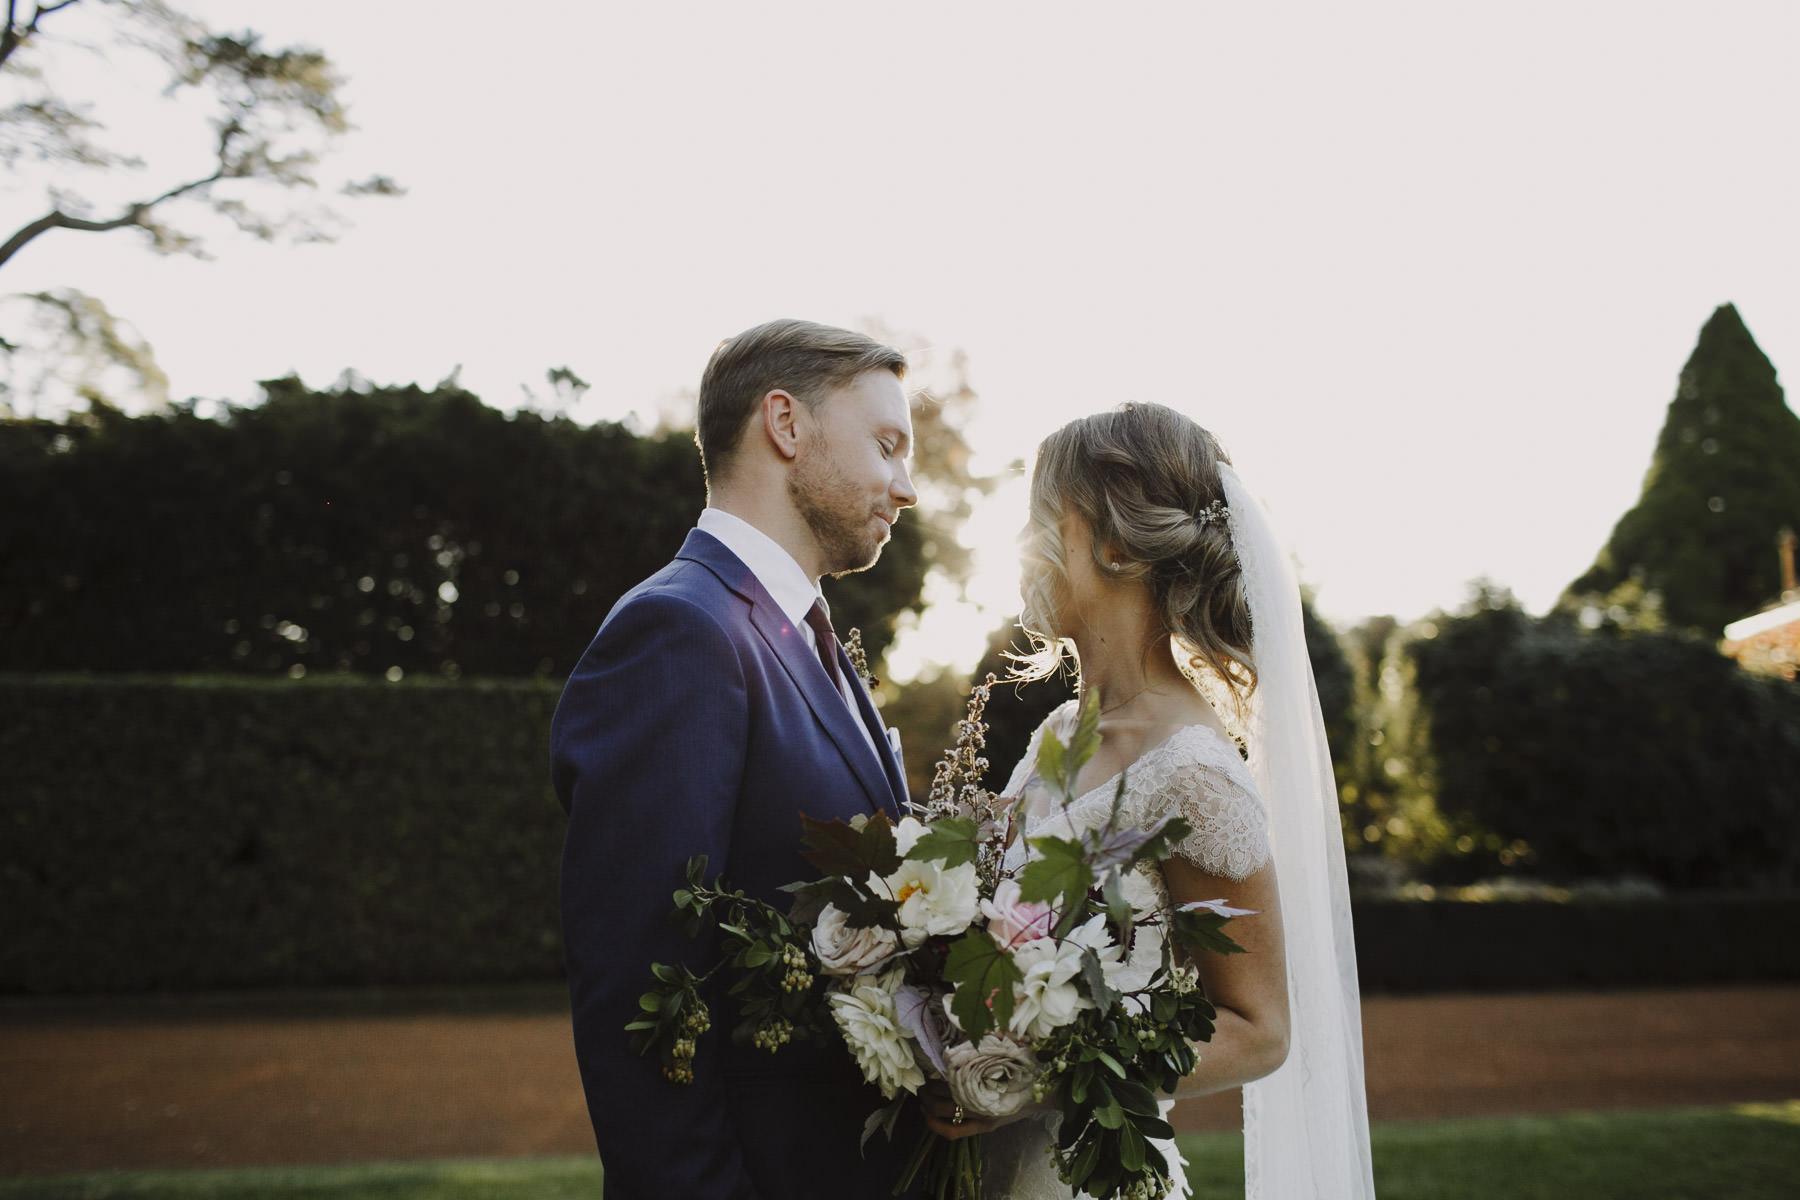 160506_justinaaron_wedding_holly_daniel_pr-162.jpg